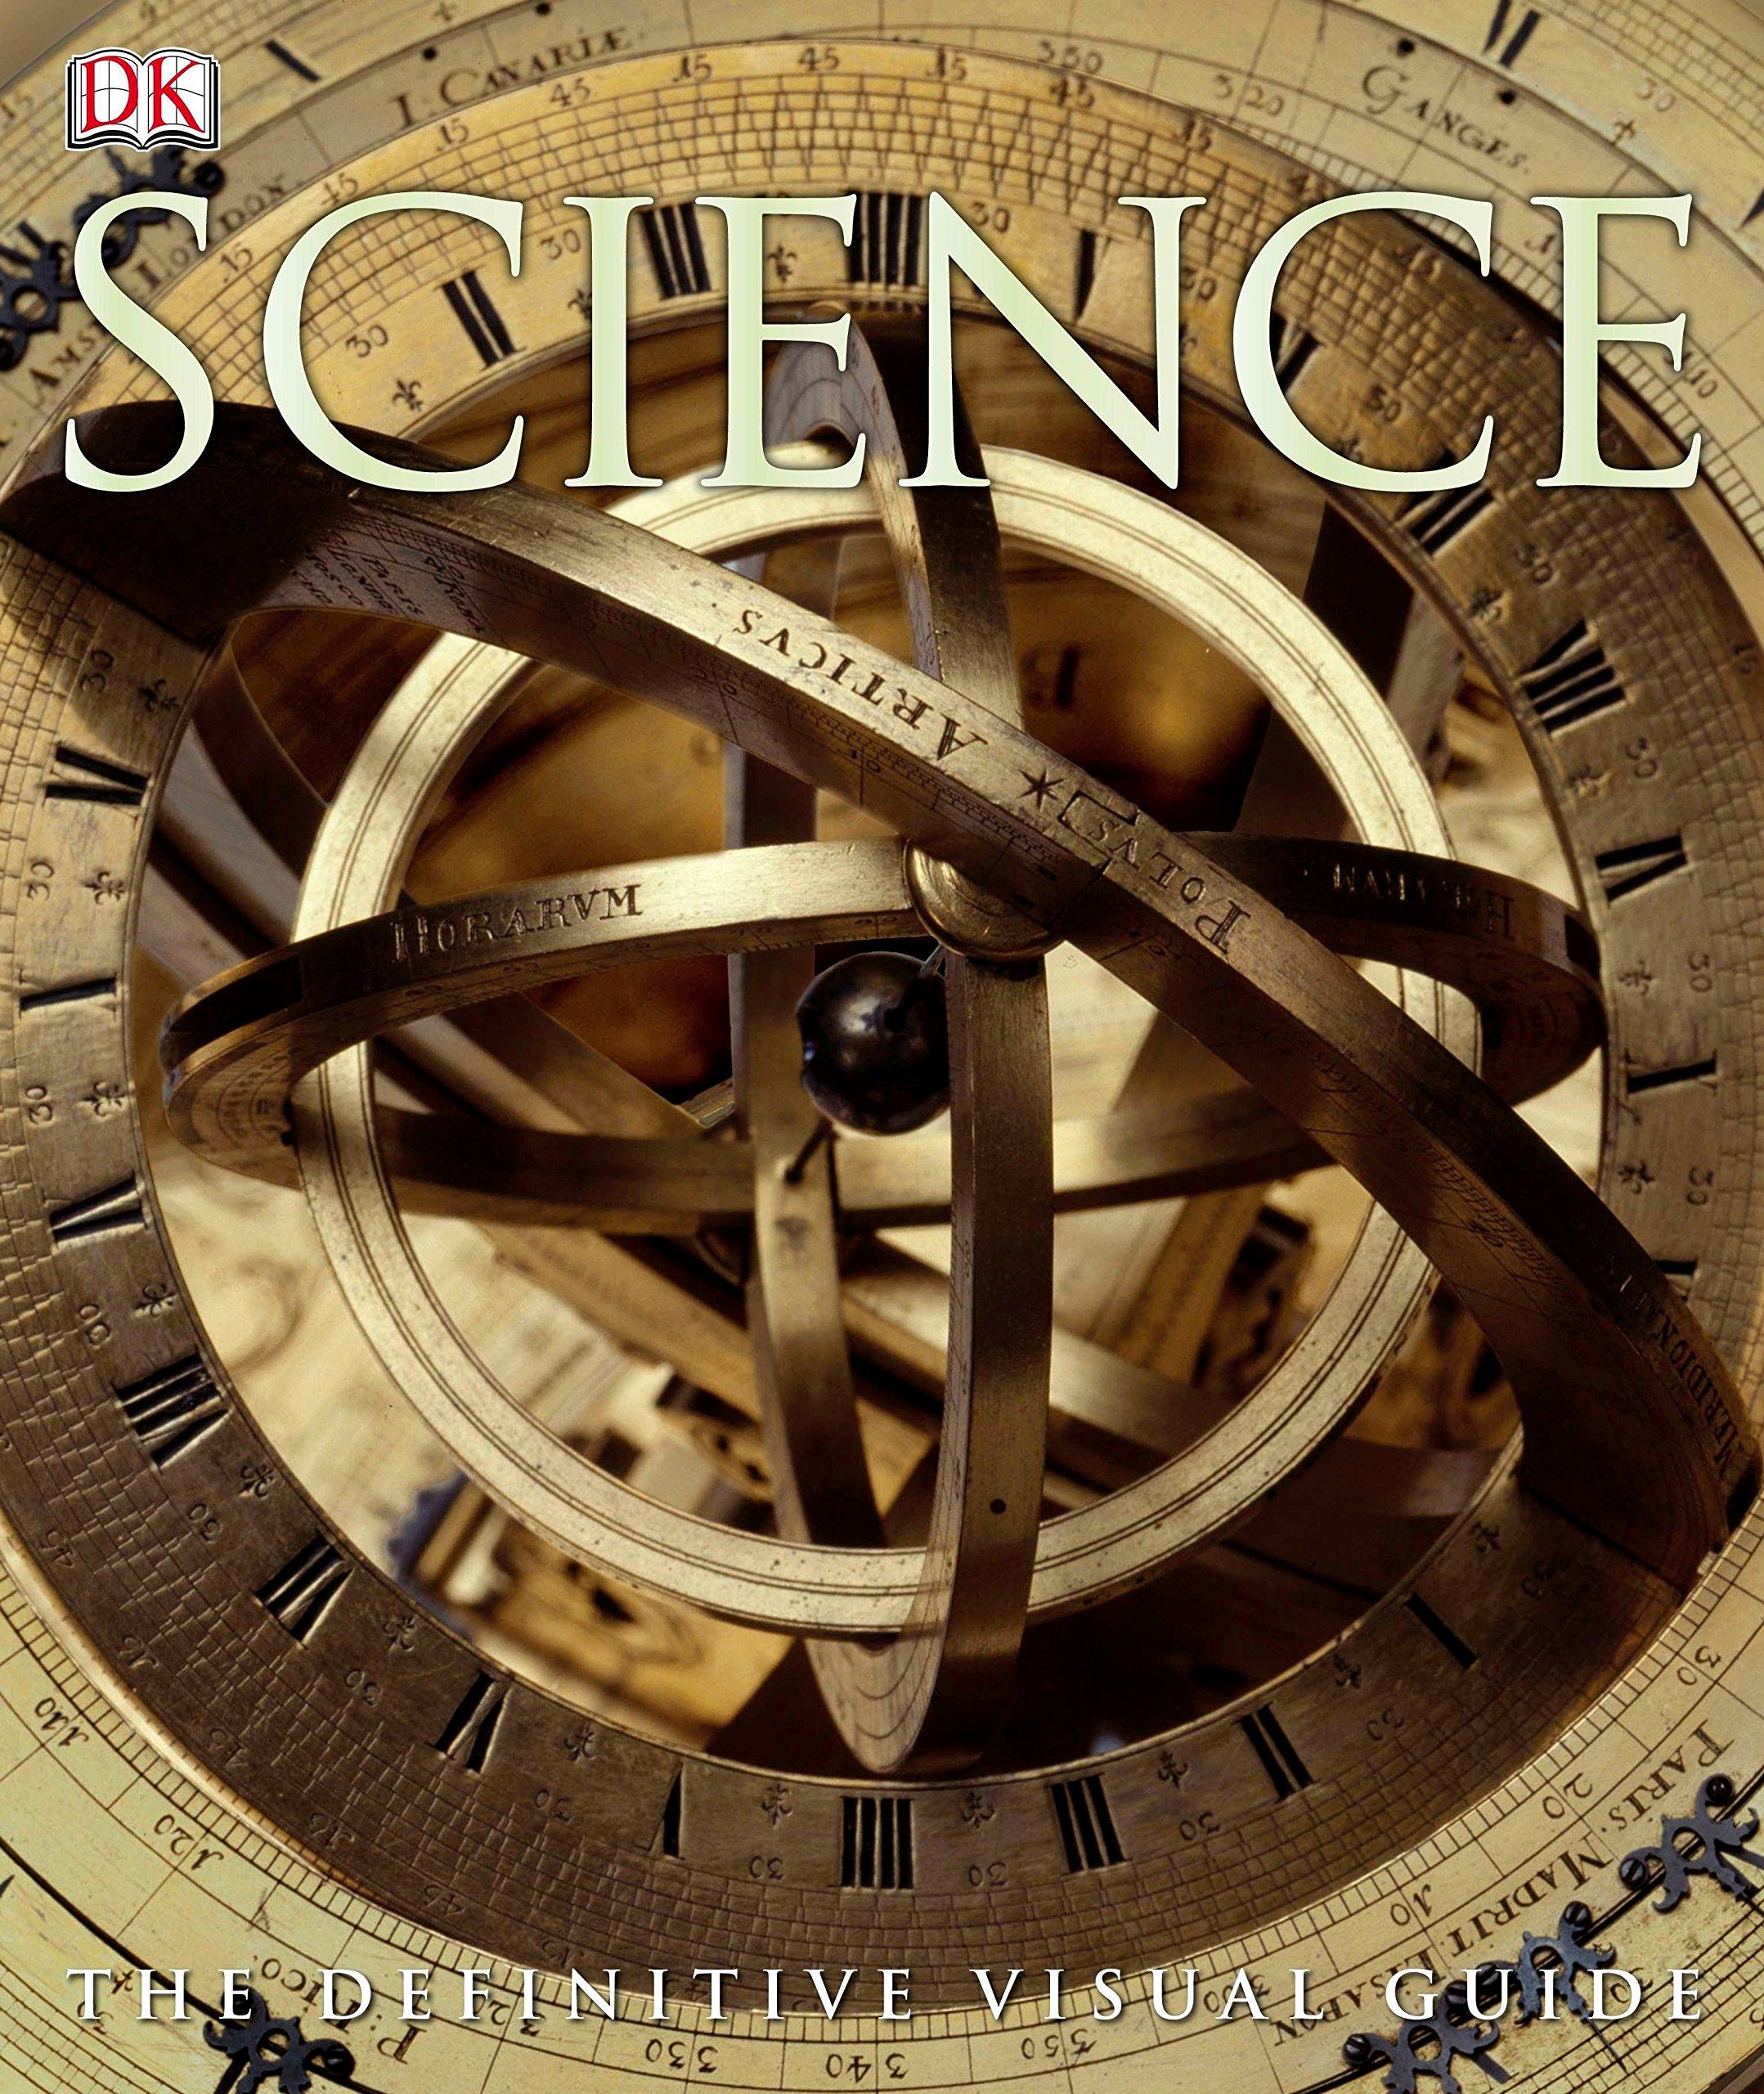 Science The Definitive Visual Guide Robert Dinwiddie Giles Sparrow Marcus Weeks Carole Stott Jack Challoner David Hughes Burnie